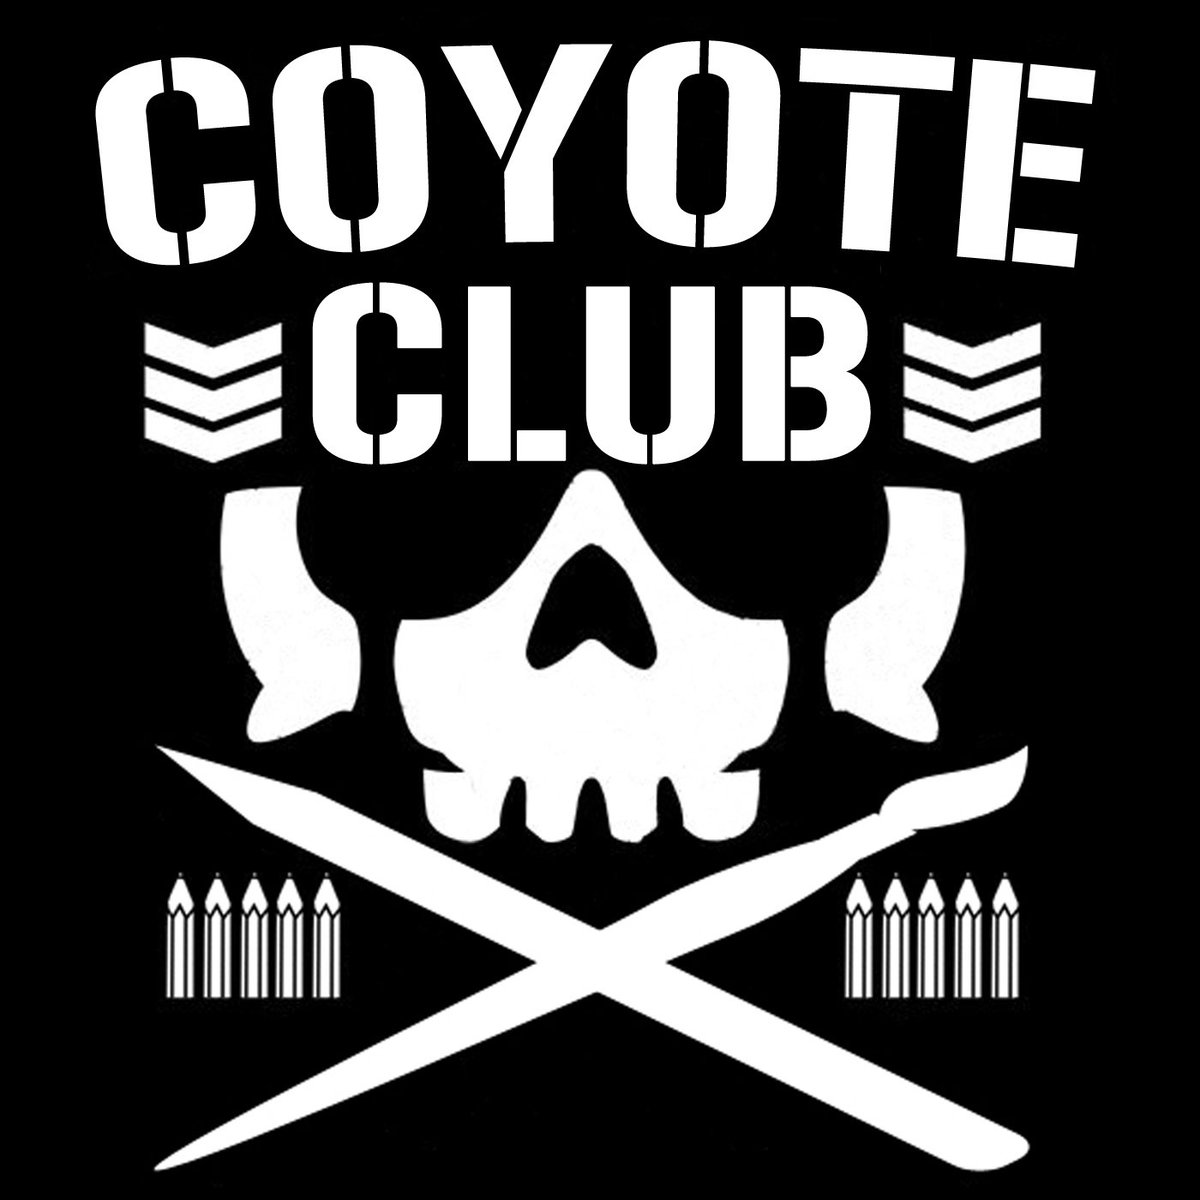 Coyote duran coyoteduran twitter 0 replies 3 retweets 3 likes buycottarizona